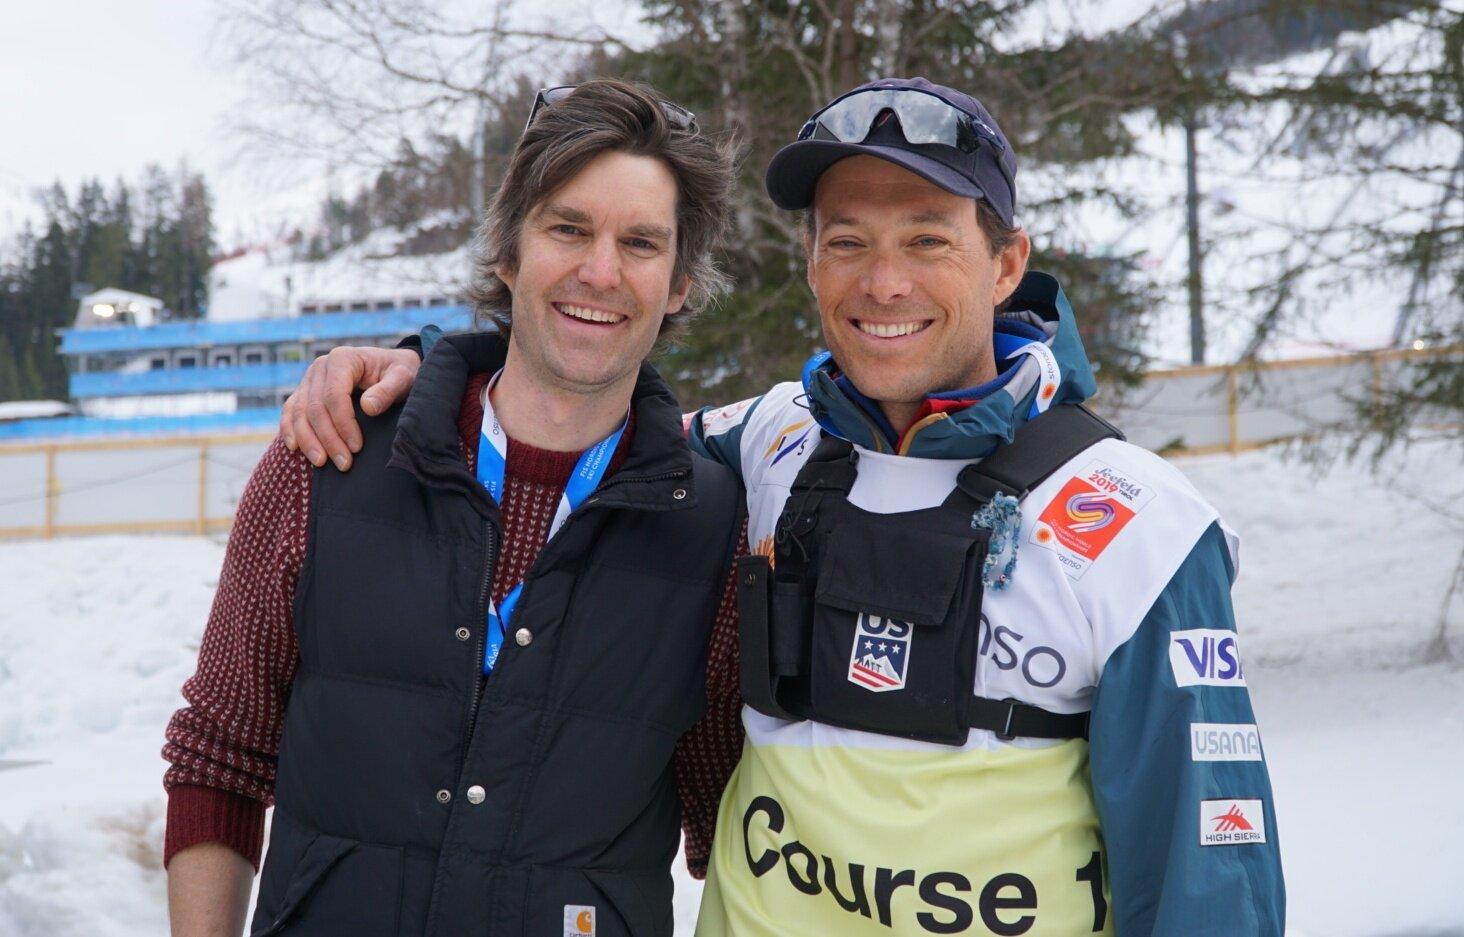 Garrott Kuzzy and US Ski Team coach Matt Whitcomb at the 2019 World Championships in Seefeld